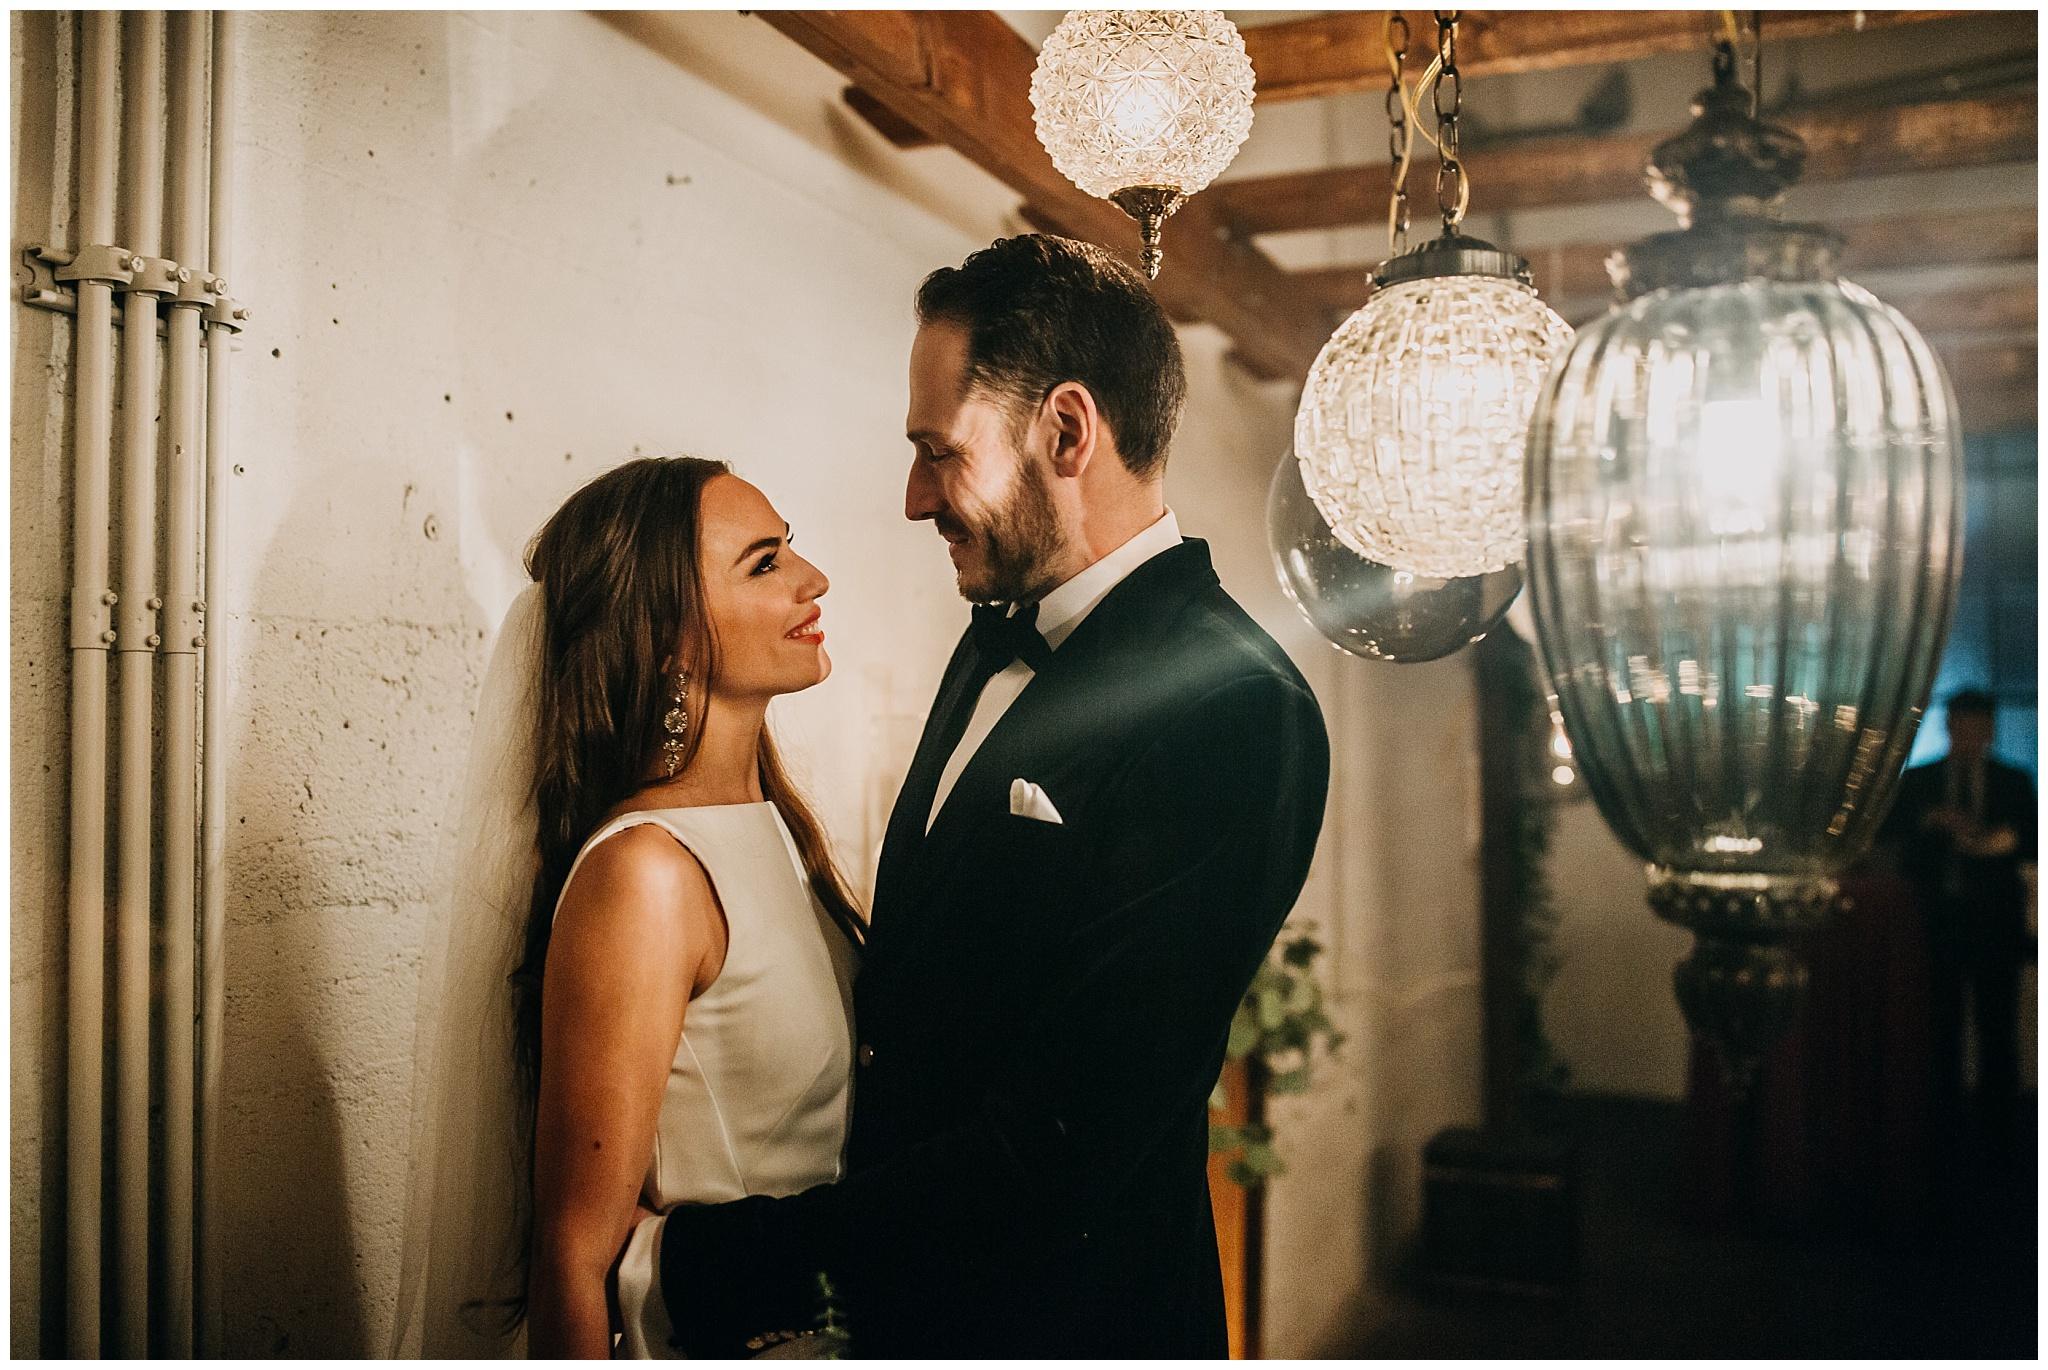 bride and groom indoor portrait at settlement building wedding